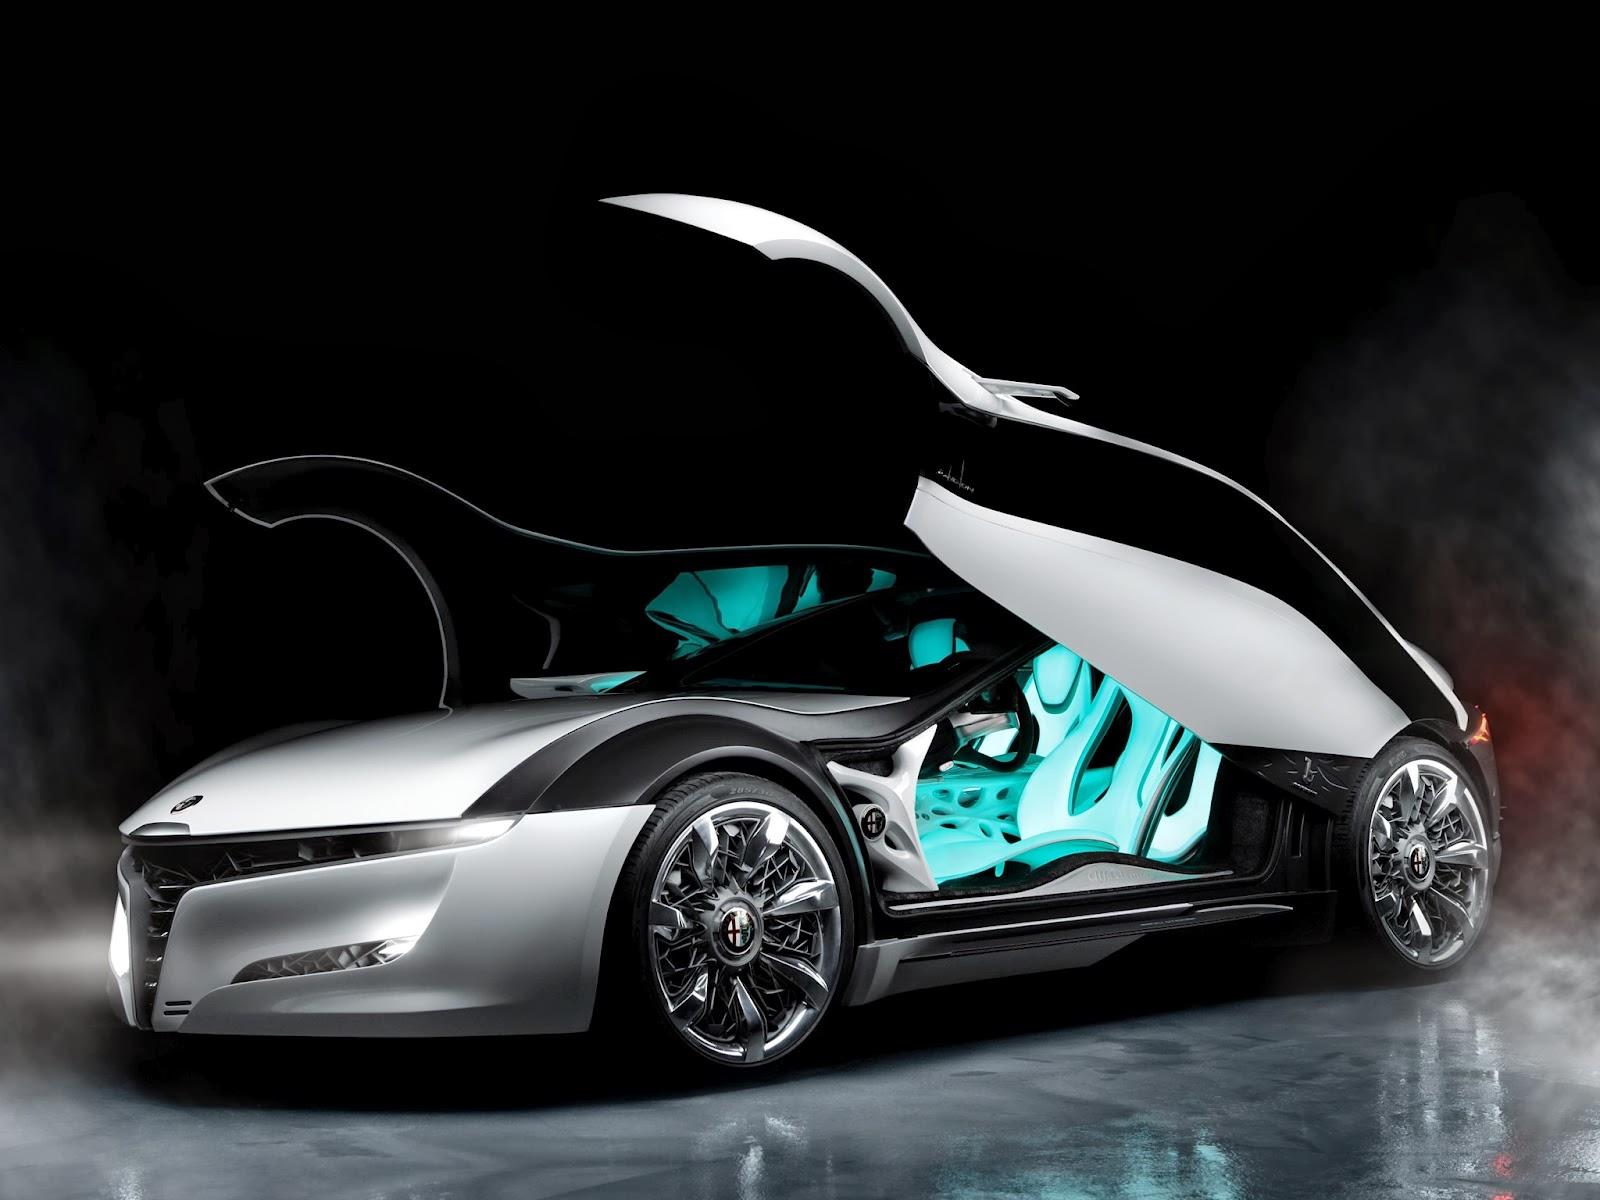 alfa romeo pandion concept car hd wallpaper carwallbase.blo.com